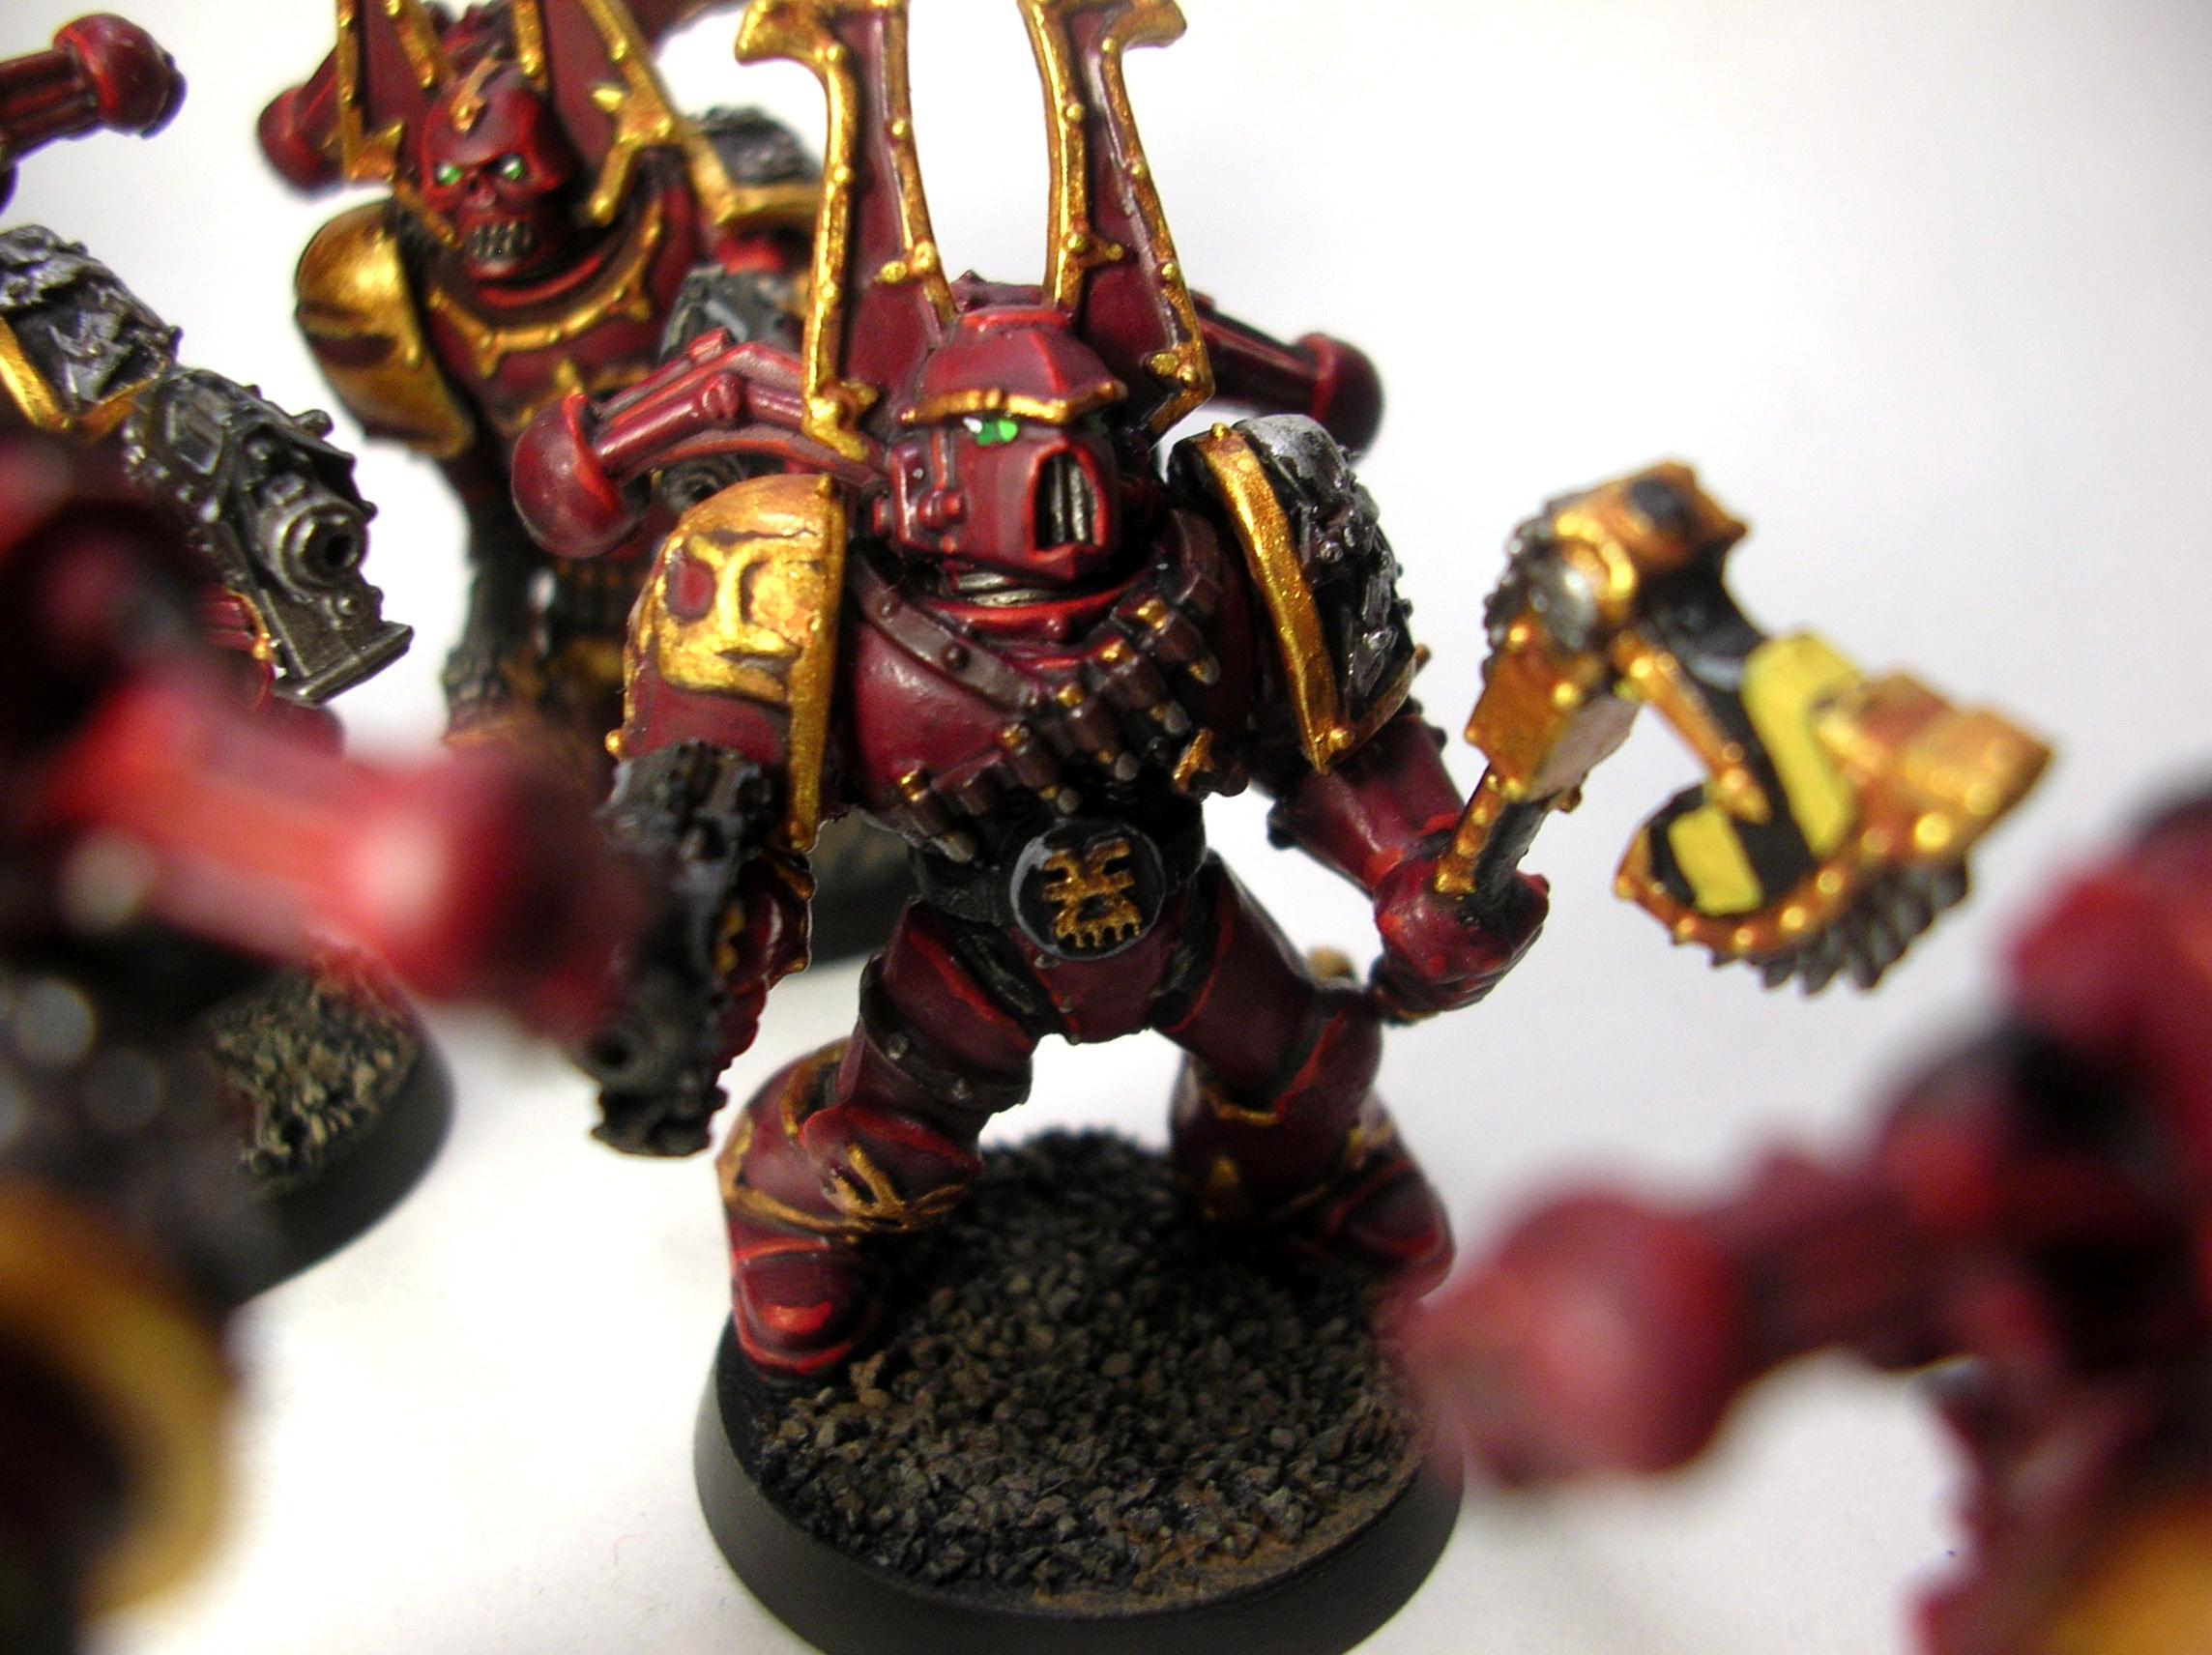 Iron Warriors, Khorne, Khorne Berserkers, Warhammer 40,000